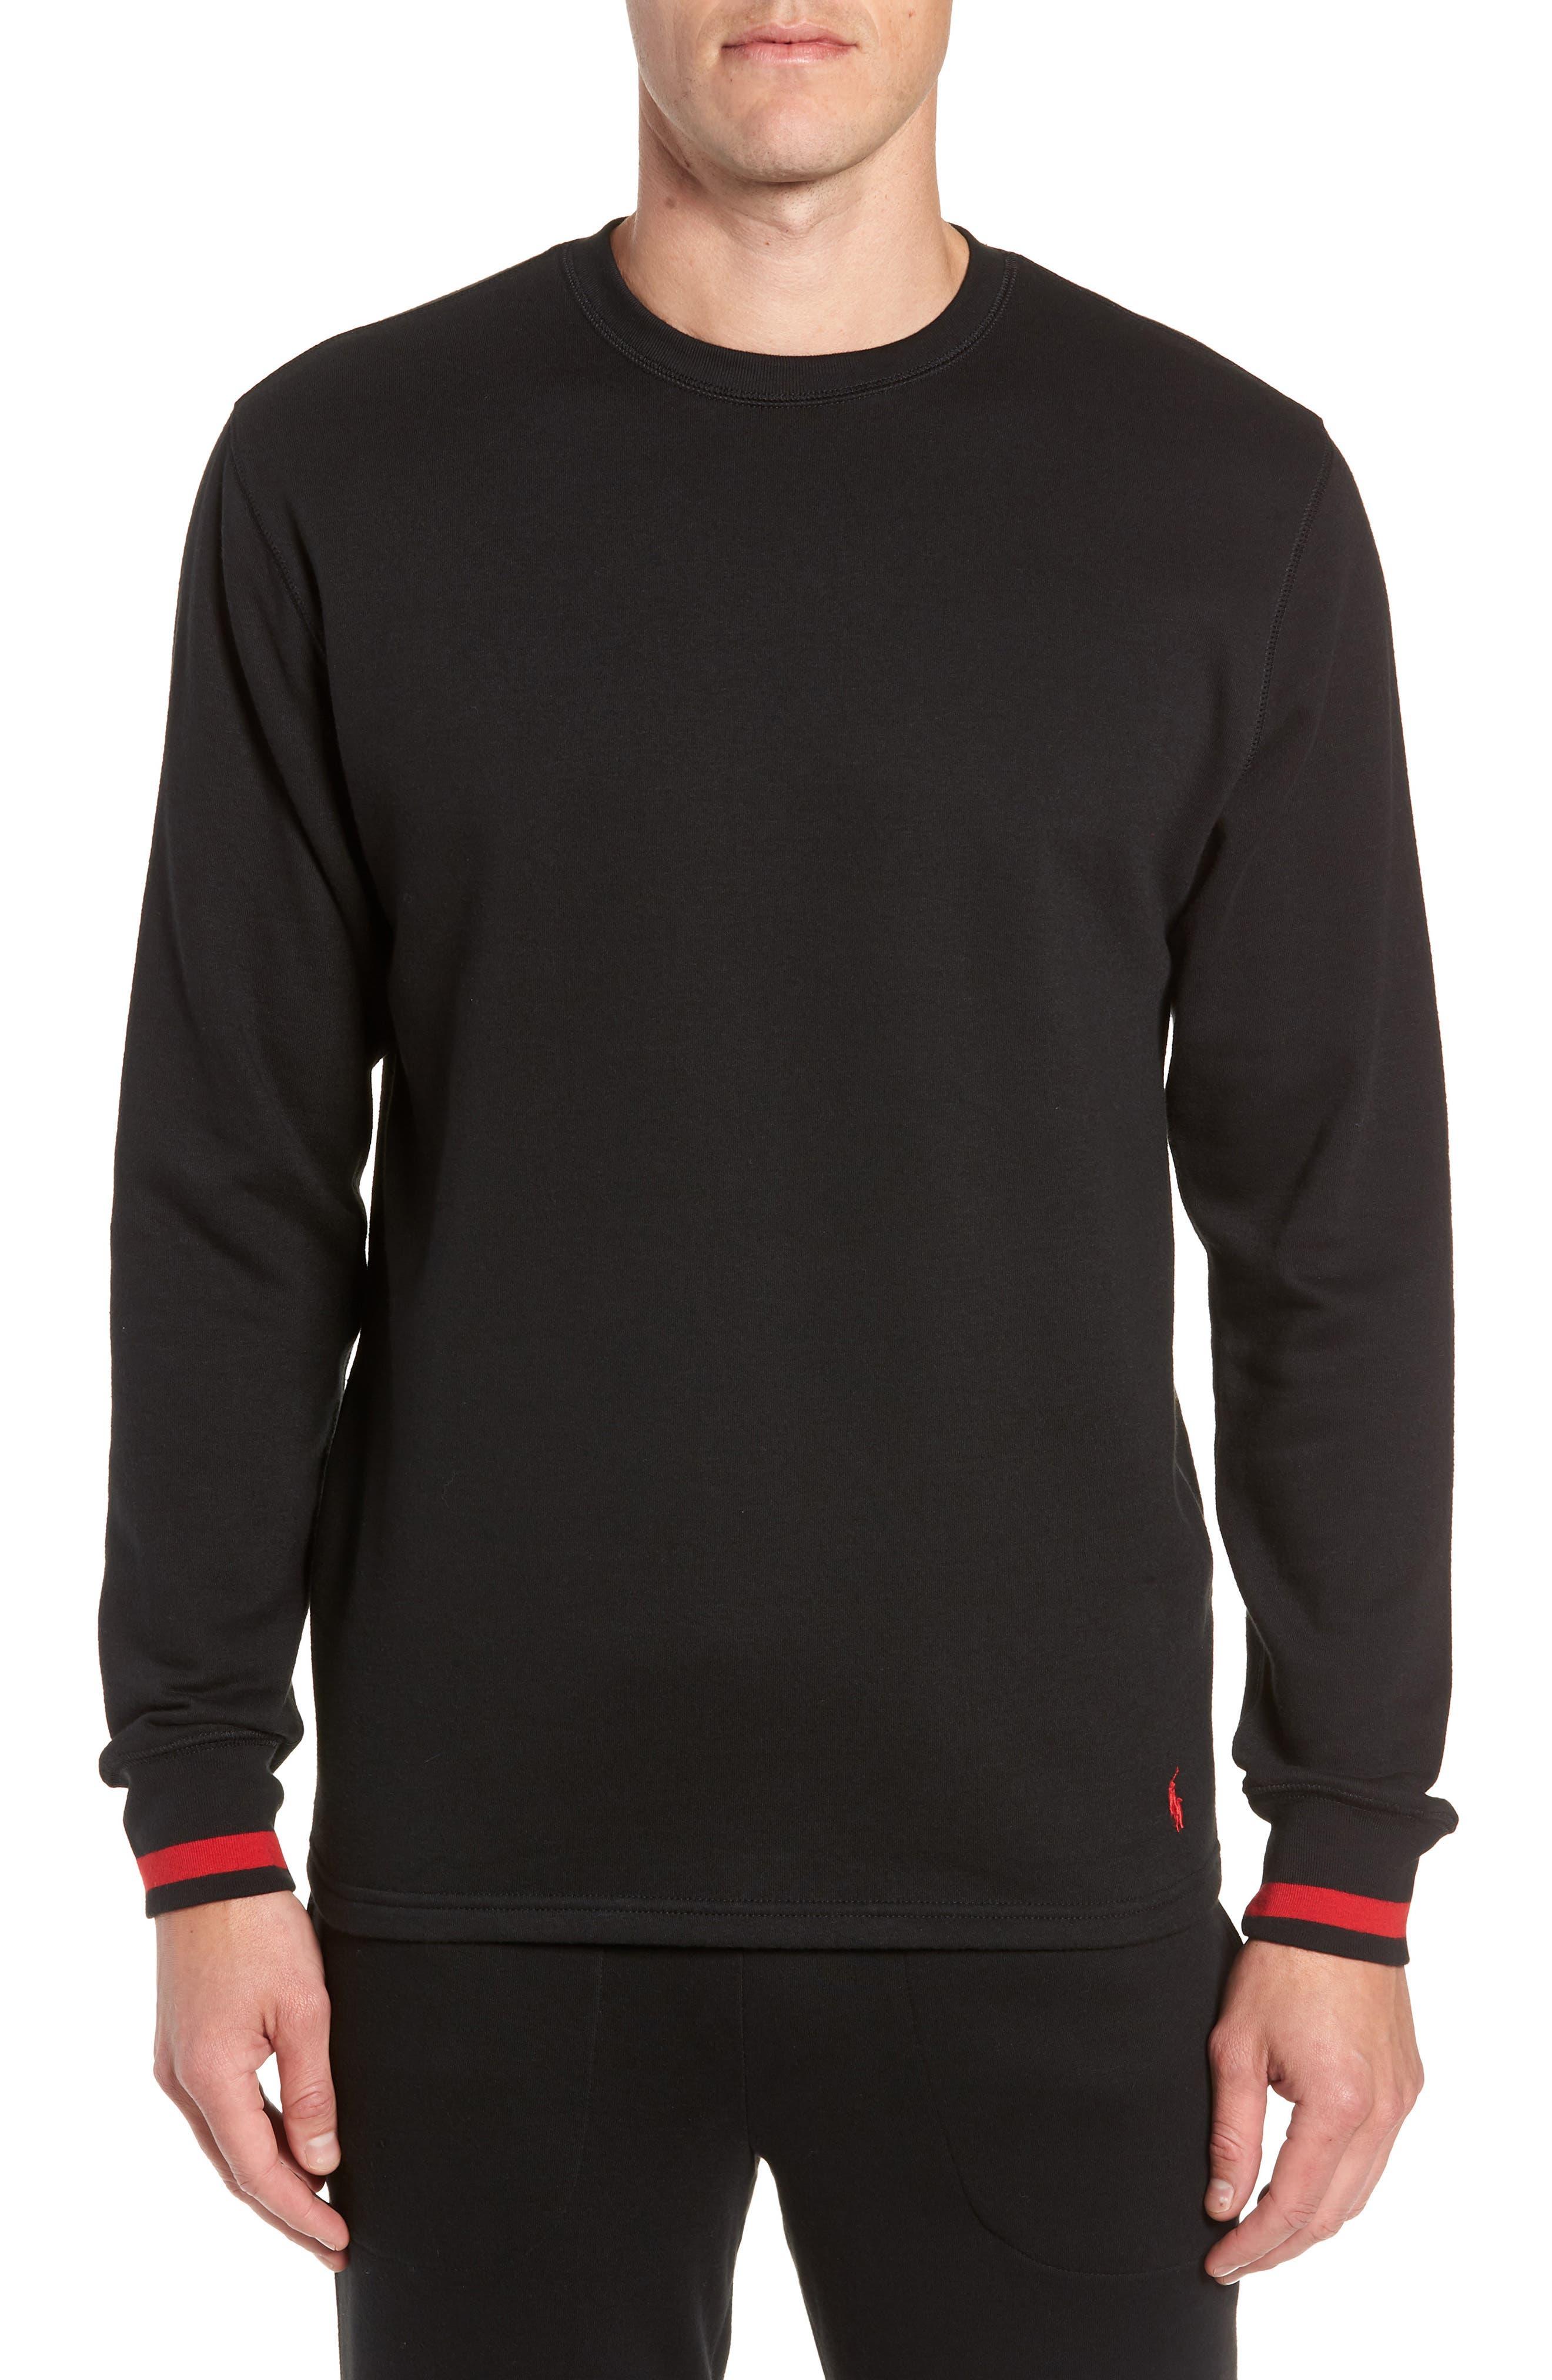 POLO RALPH LAUREN,                             Brushed Jersey Cotton Blend Crewneck Sweatshirt,                             Main thumbnail 1, color,                             POLO BLACK